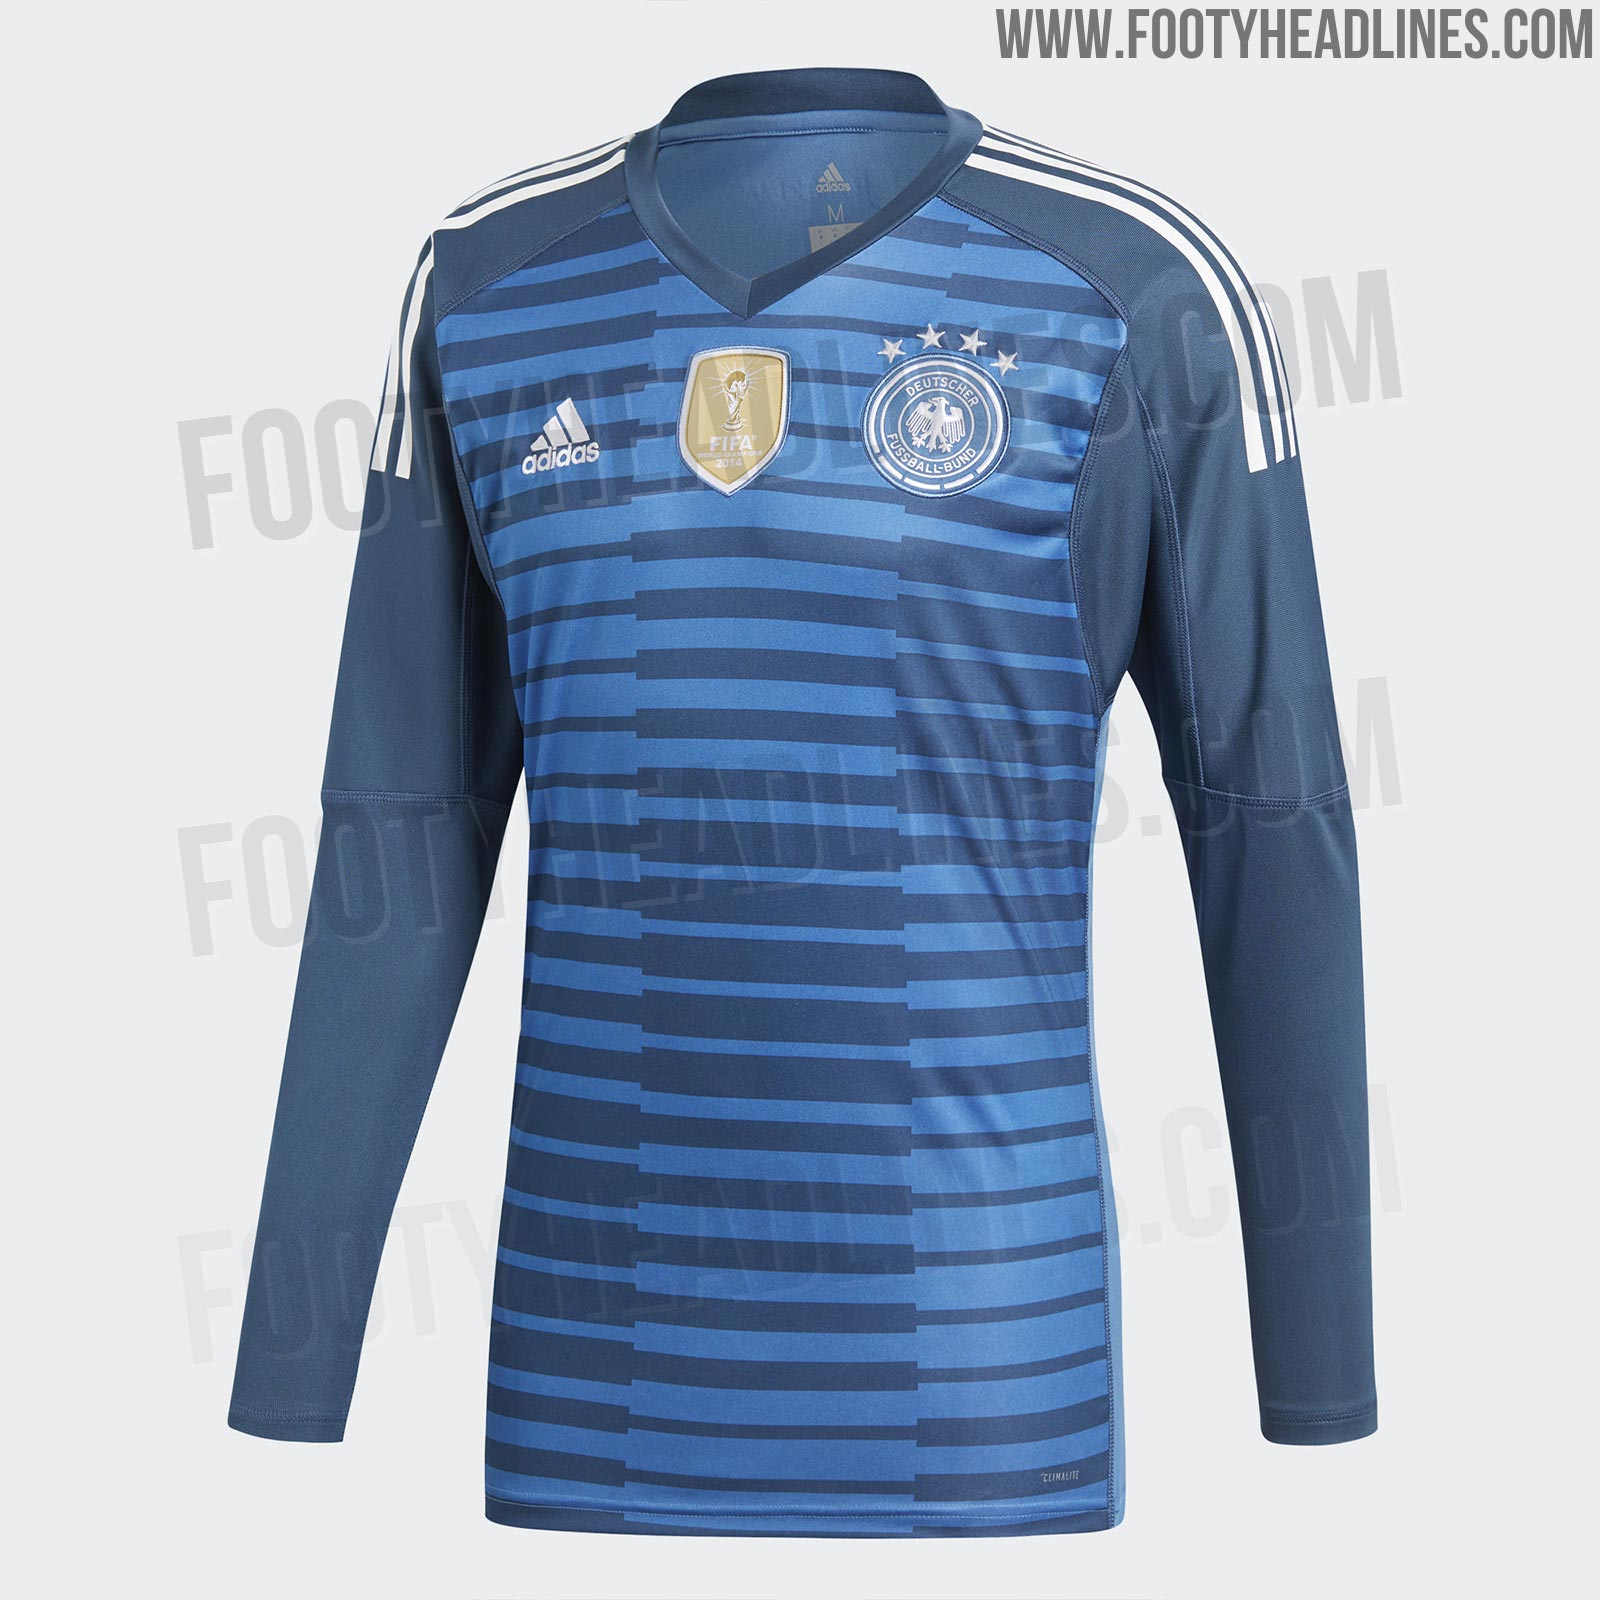 English Calendar Kits Fibocom Wireless Inc Germany 2018 World Cup Goalkeeper Kit Released Footy